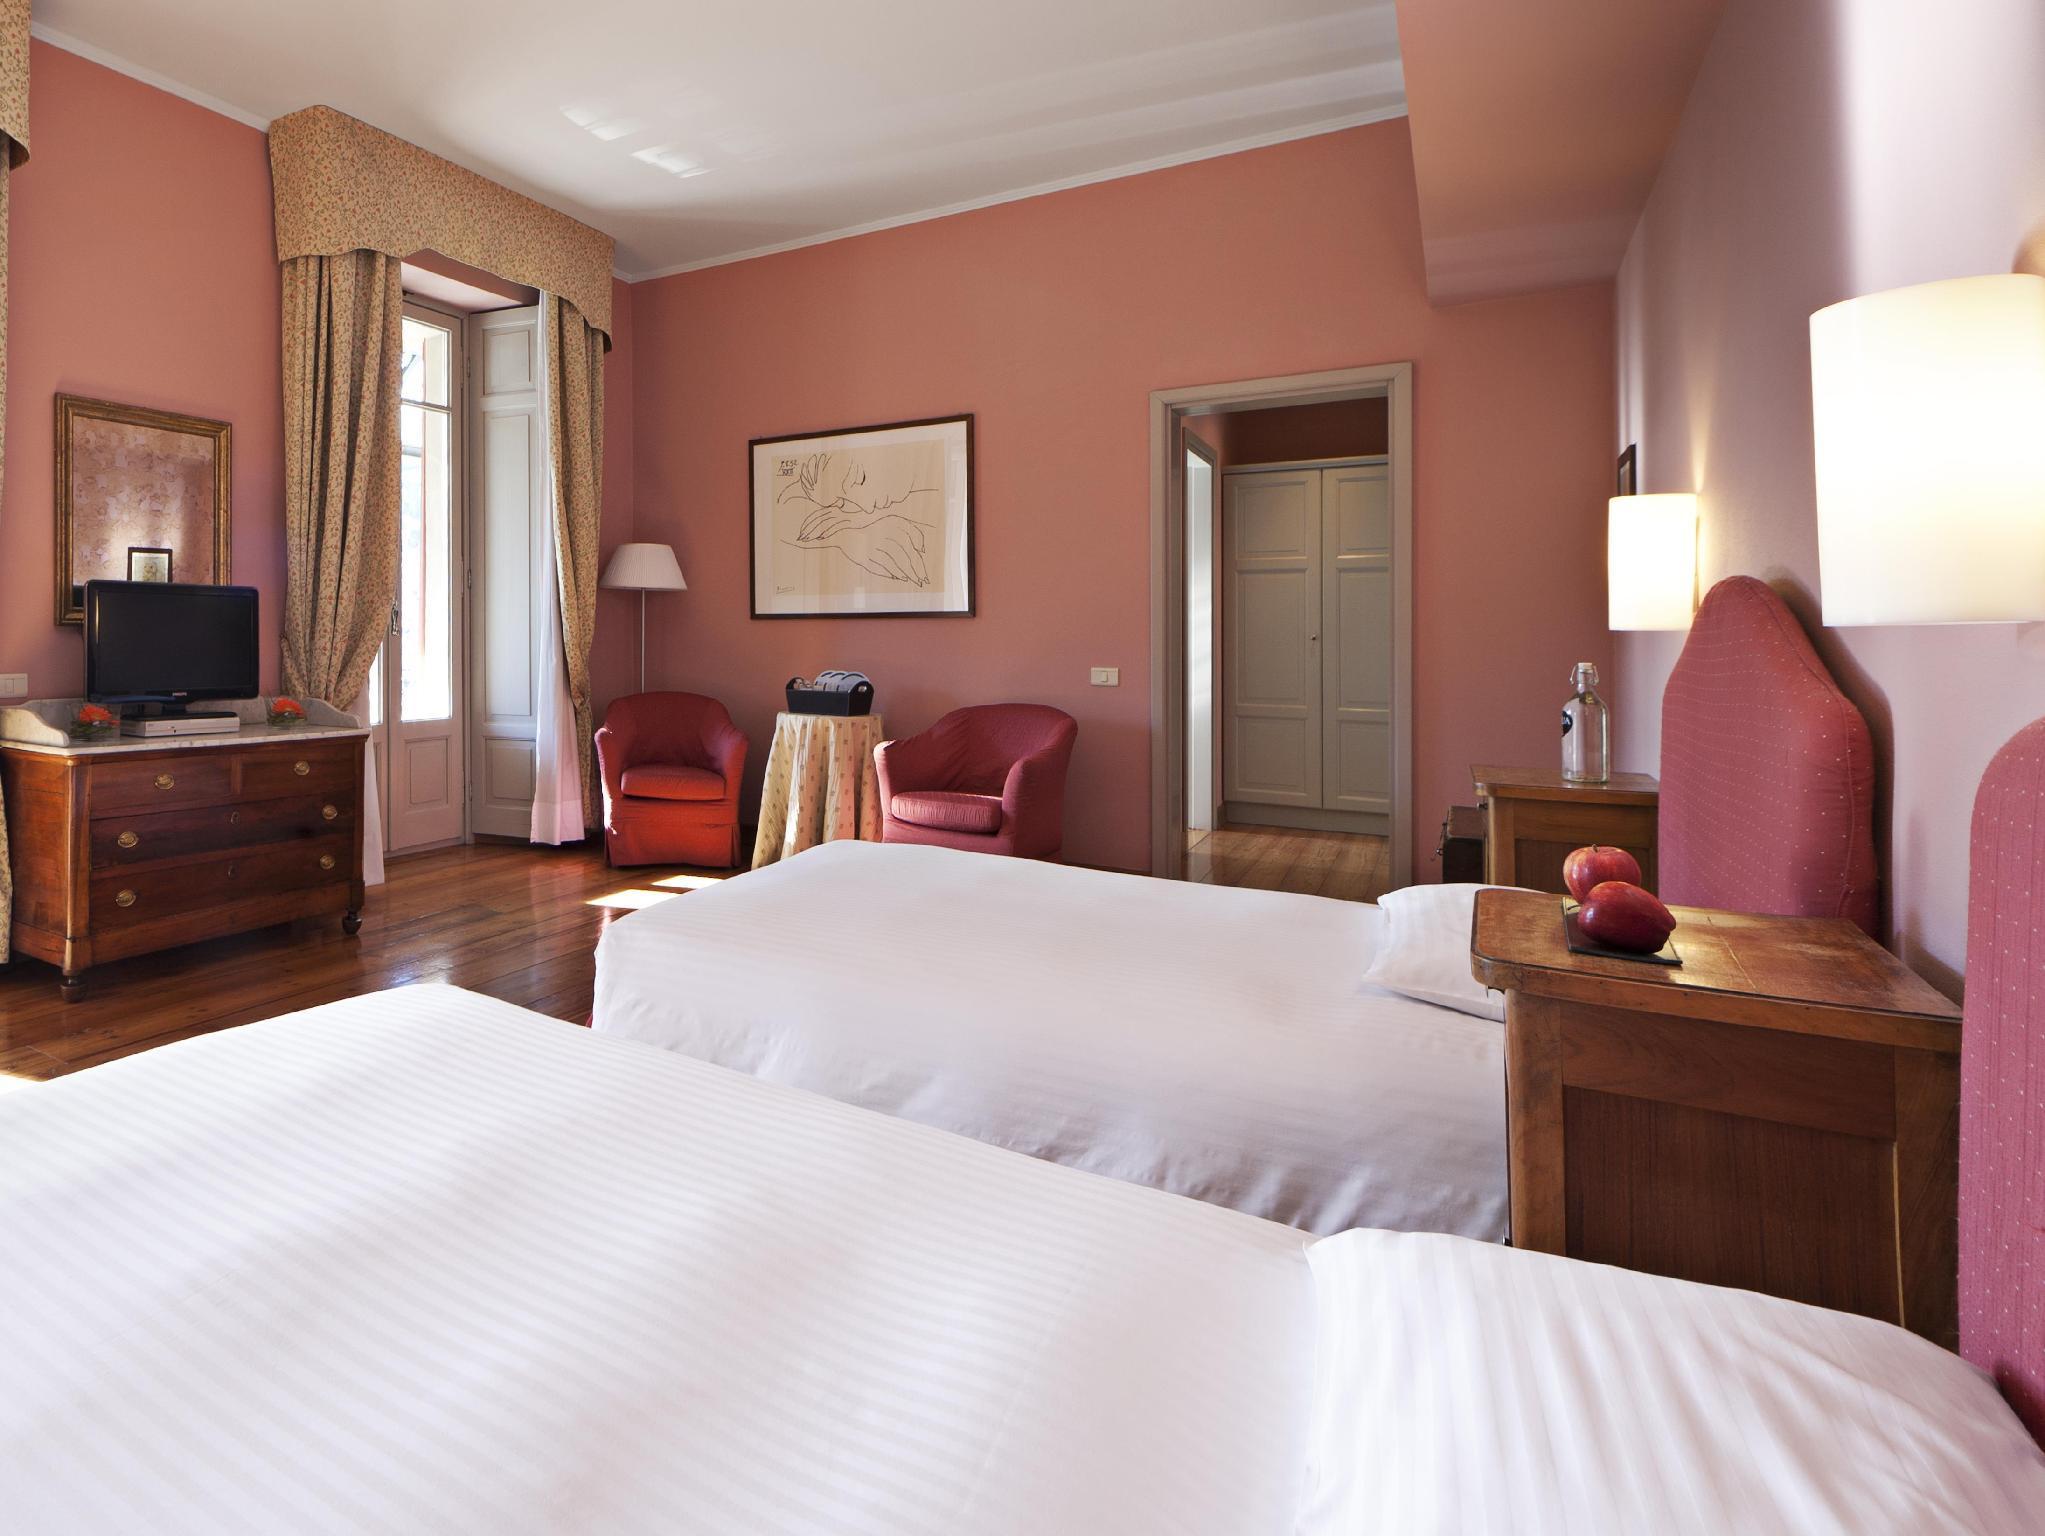 Best Price on Grand Hotel Bagni Nuovi in Bormio + Reviews!